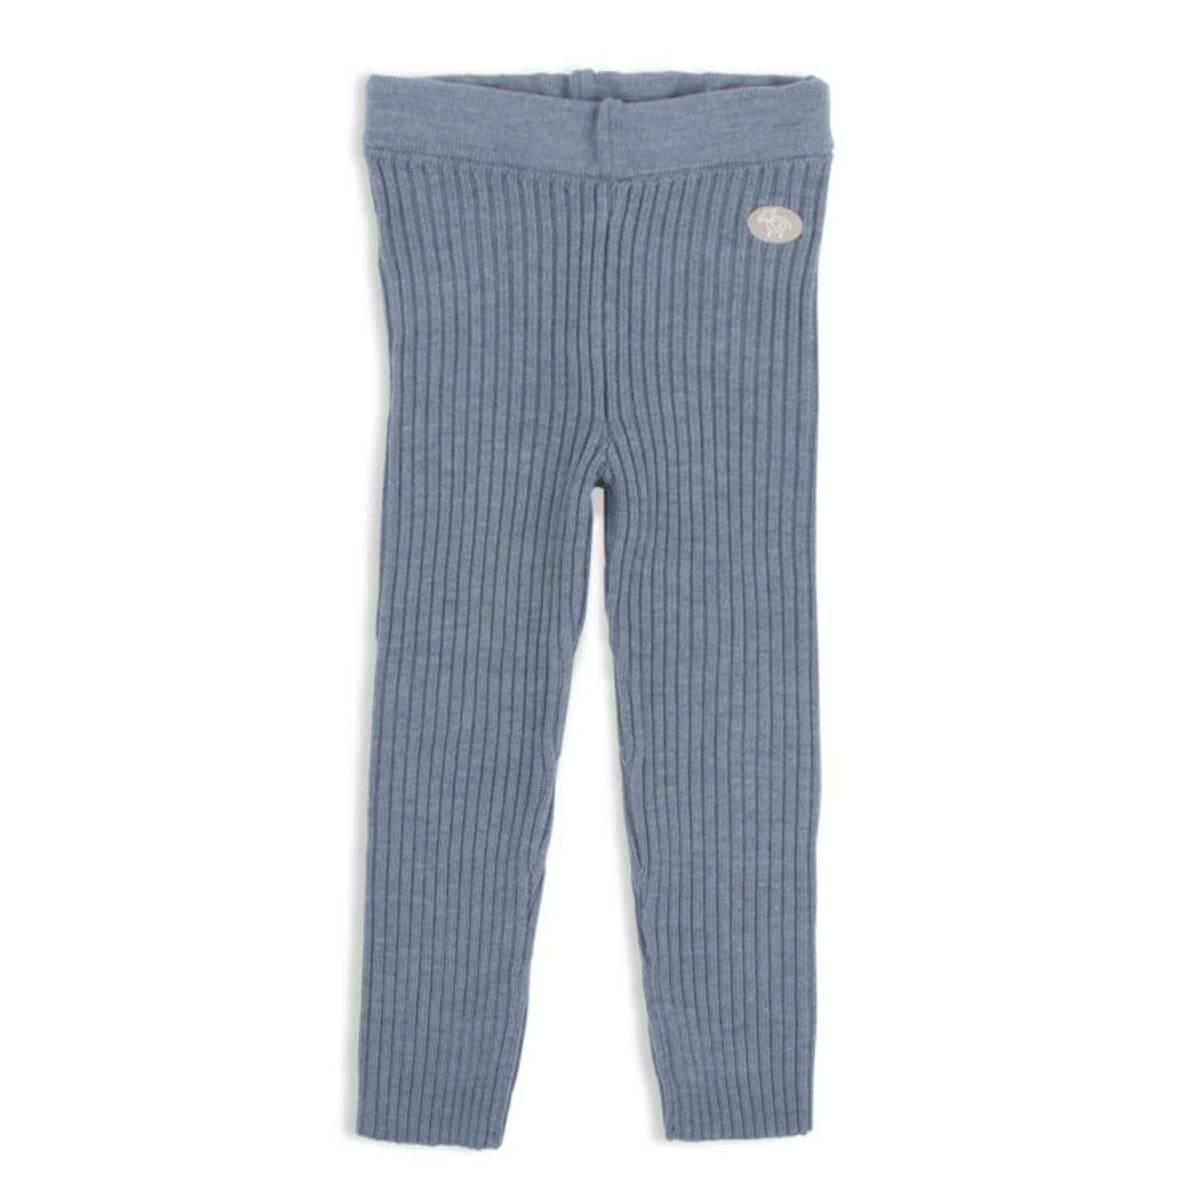 Lillelam bukse classic ribb - mellomblå